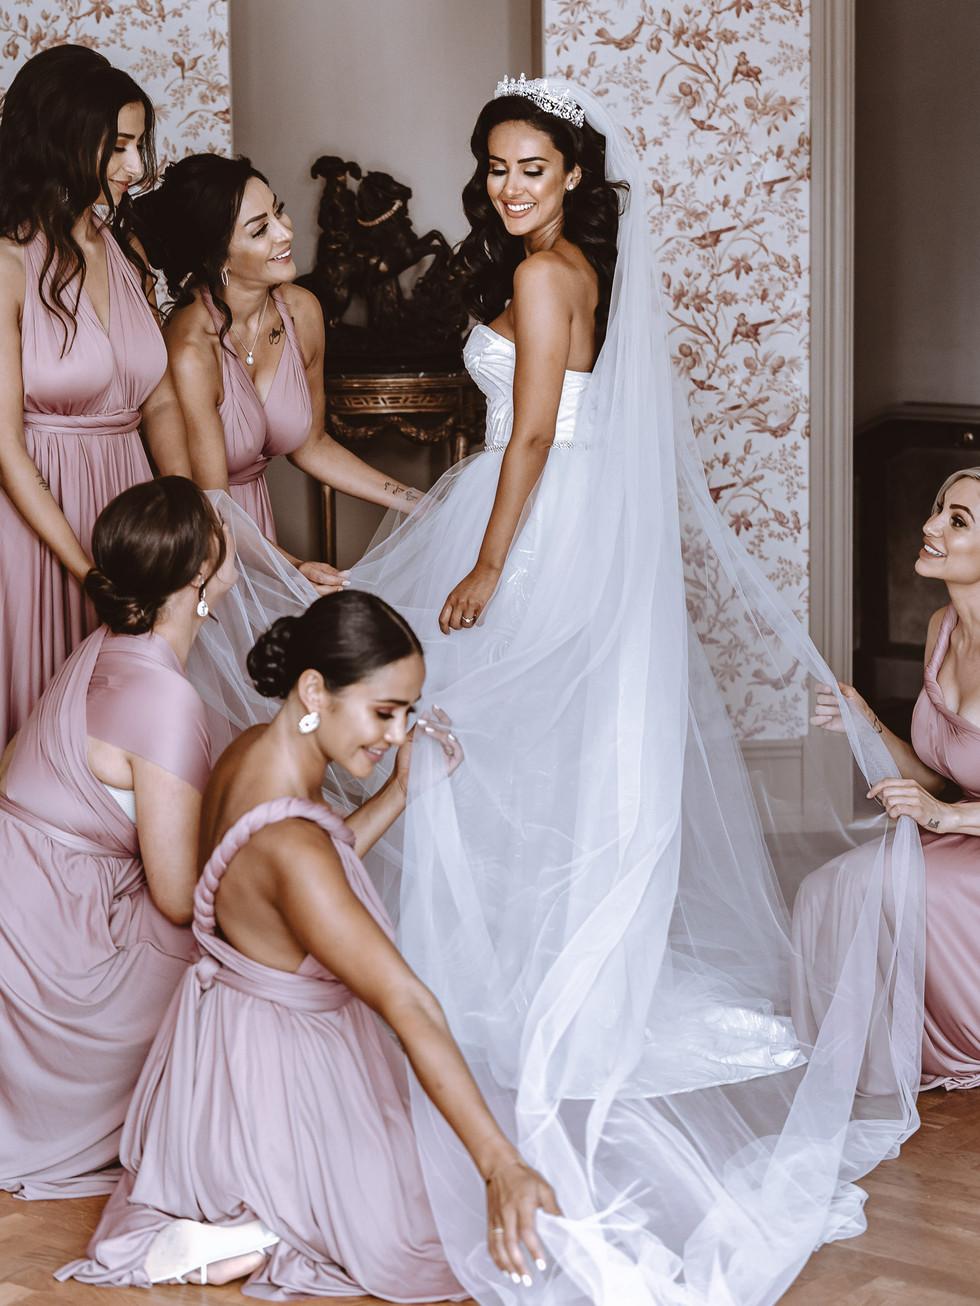 preparing the weddingdress